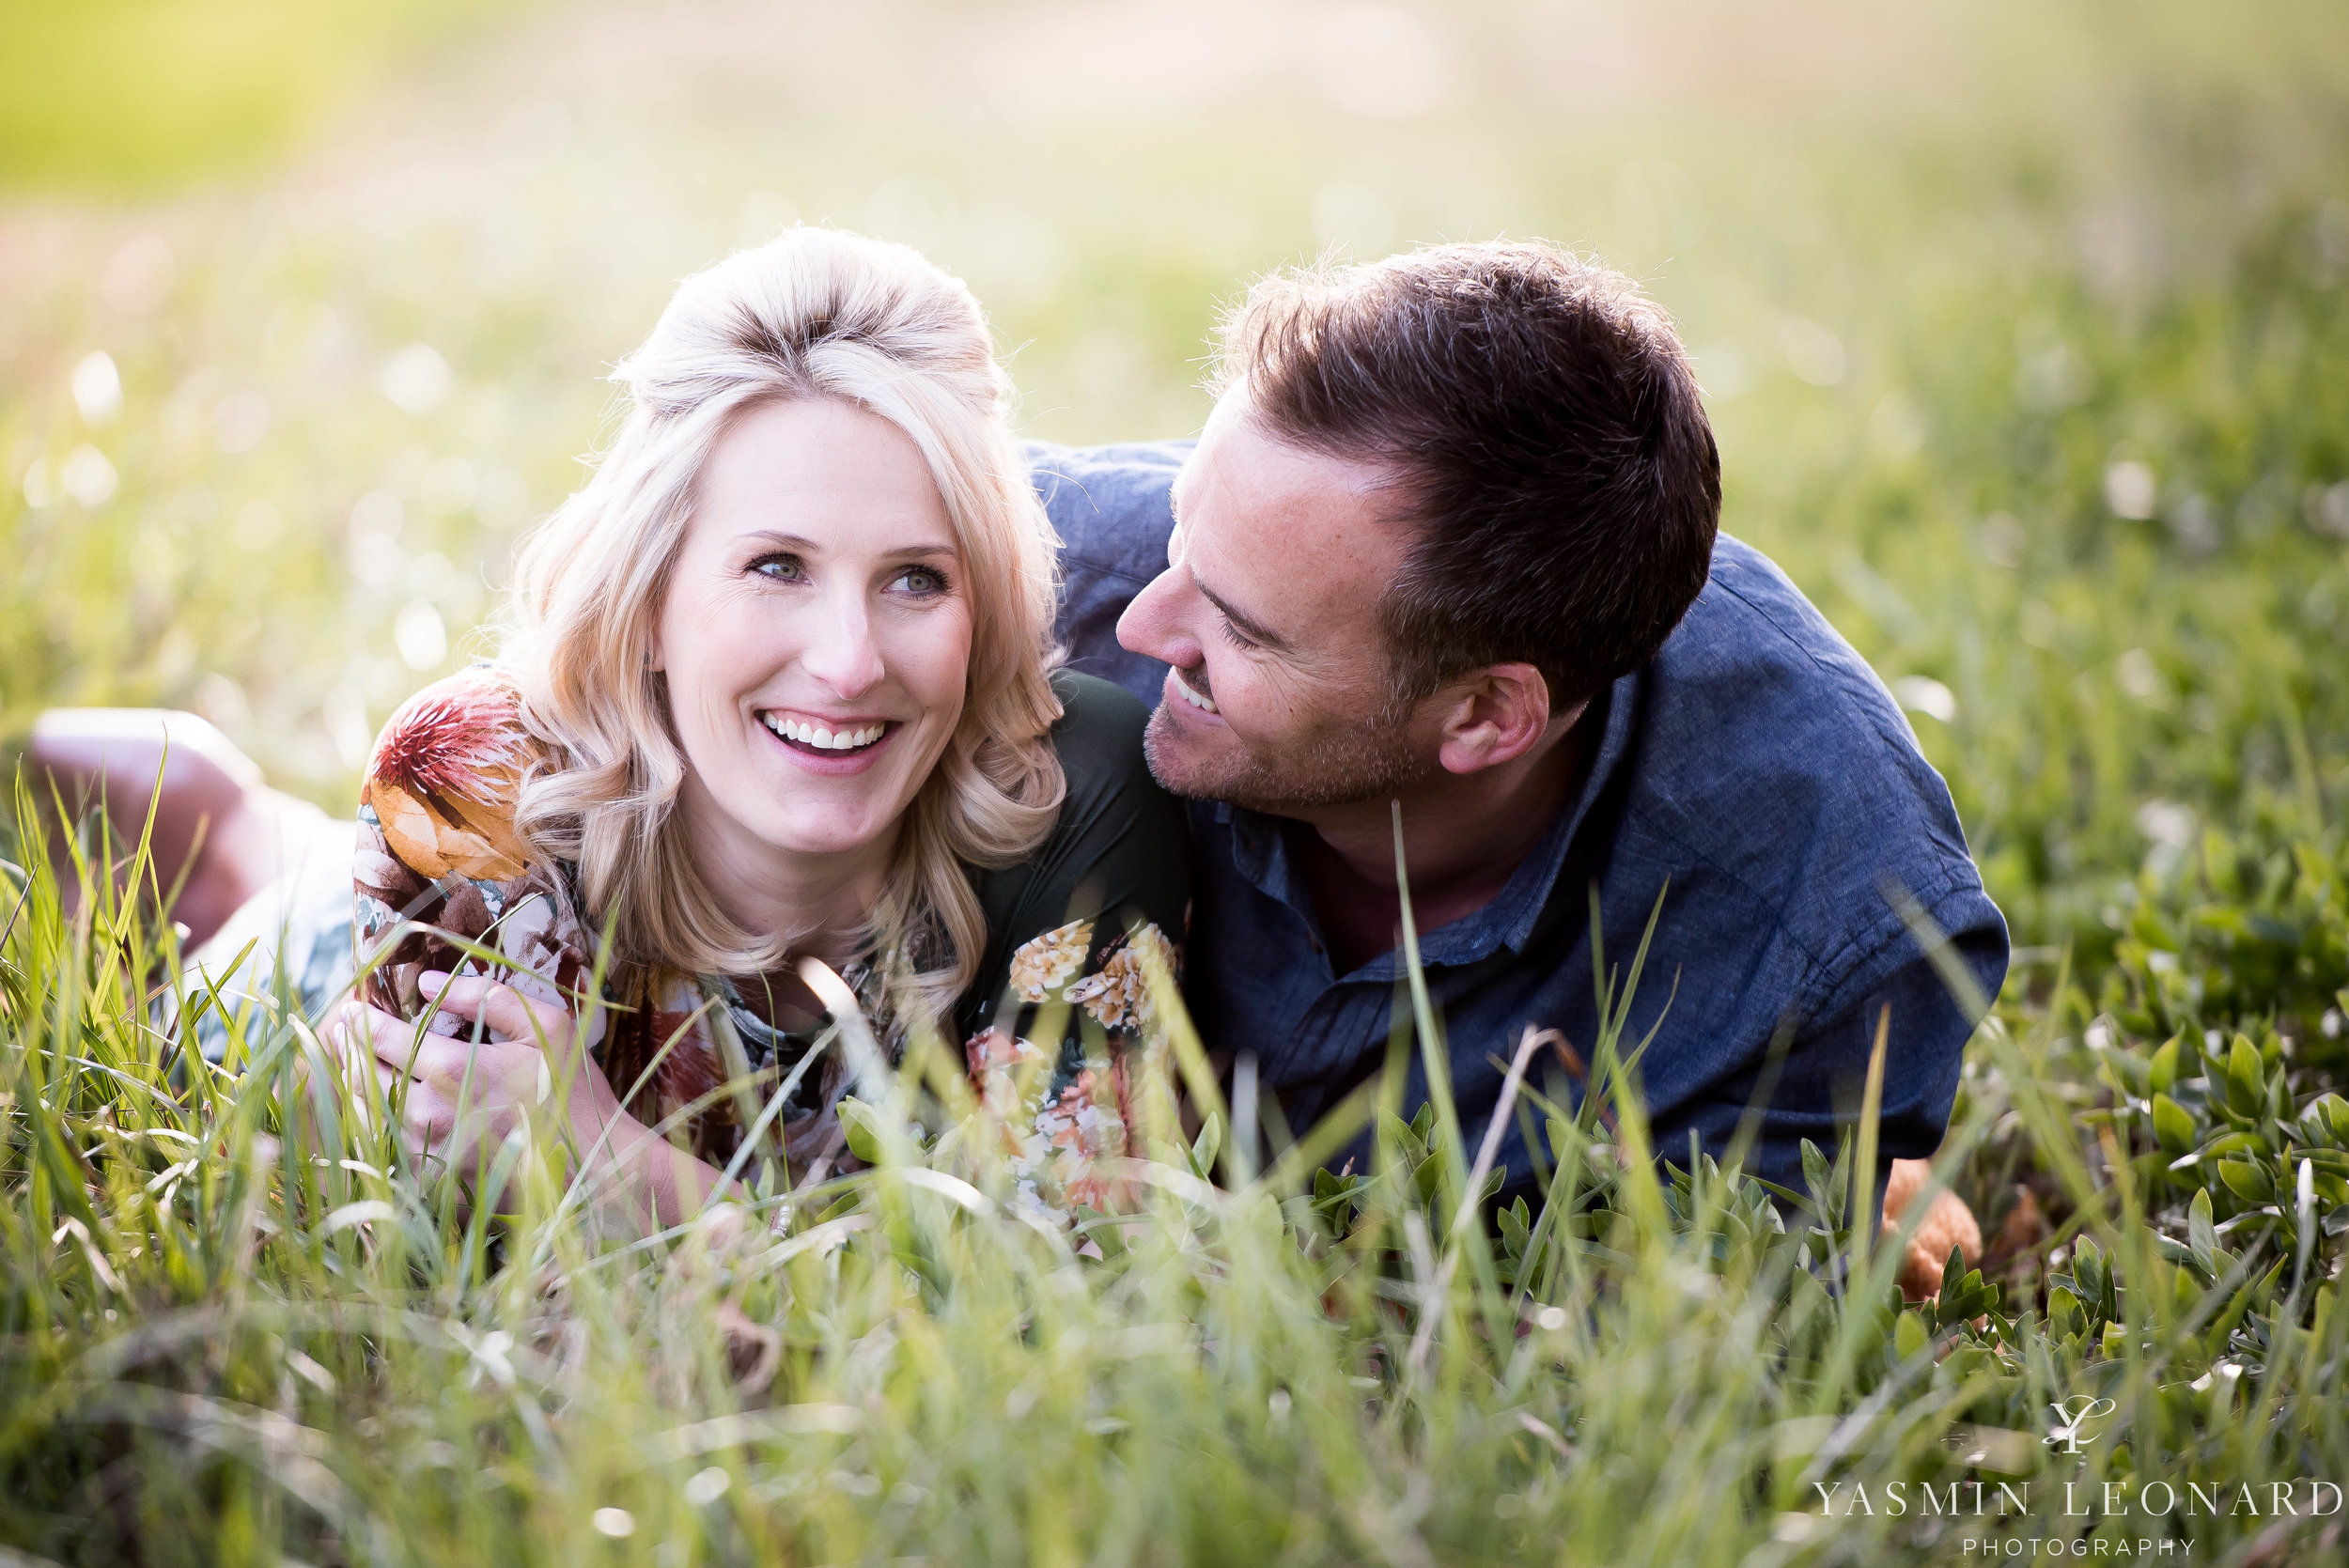 High Point Wedding Photographer - NC Wedding Photographer - Yasmin Leonard Photography - Engagement Poses - Engagement Ideas - Outdoor Engagement Session-1.jpg